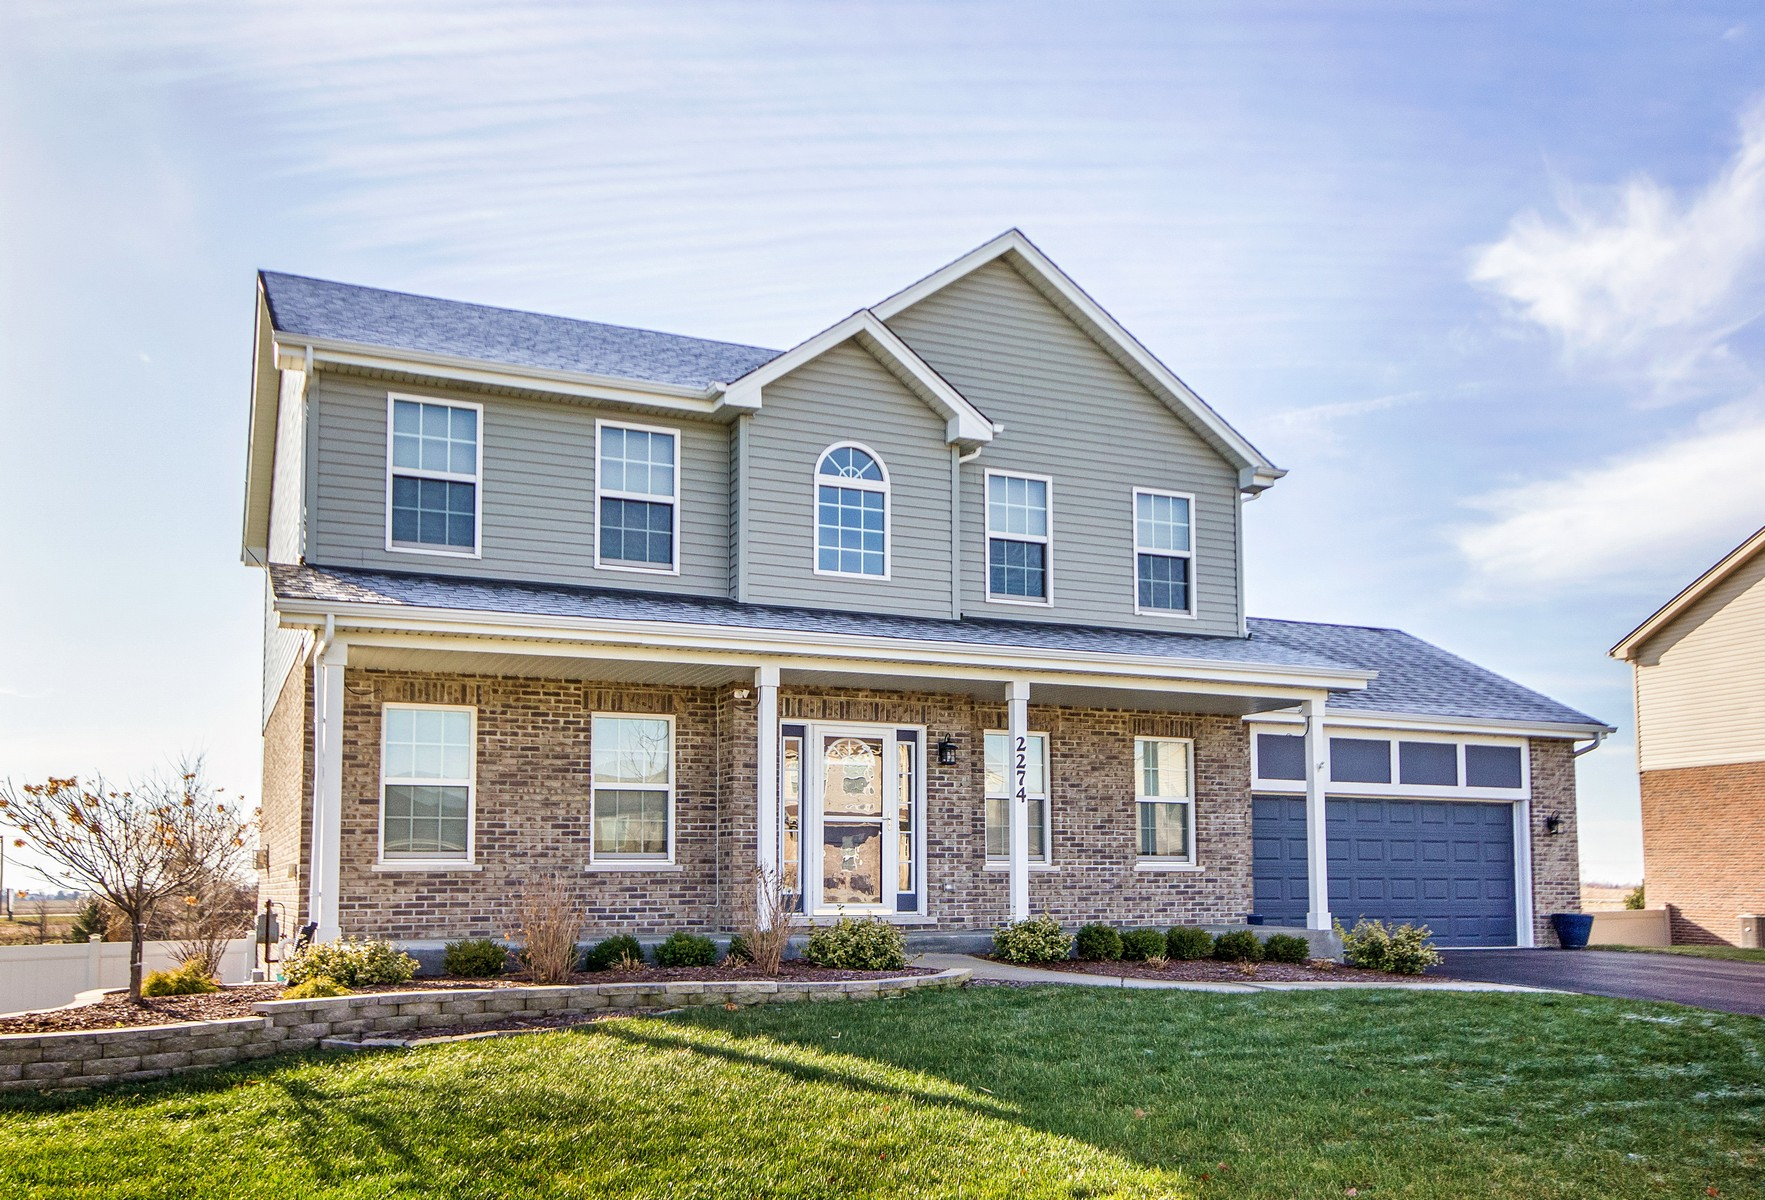 Casa para uma família para Venda às Beautiful Home in Heather Glen 2274 Scotsglen Drive New Lenox, Illinois, 60451 Estados Unidos